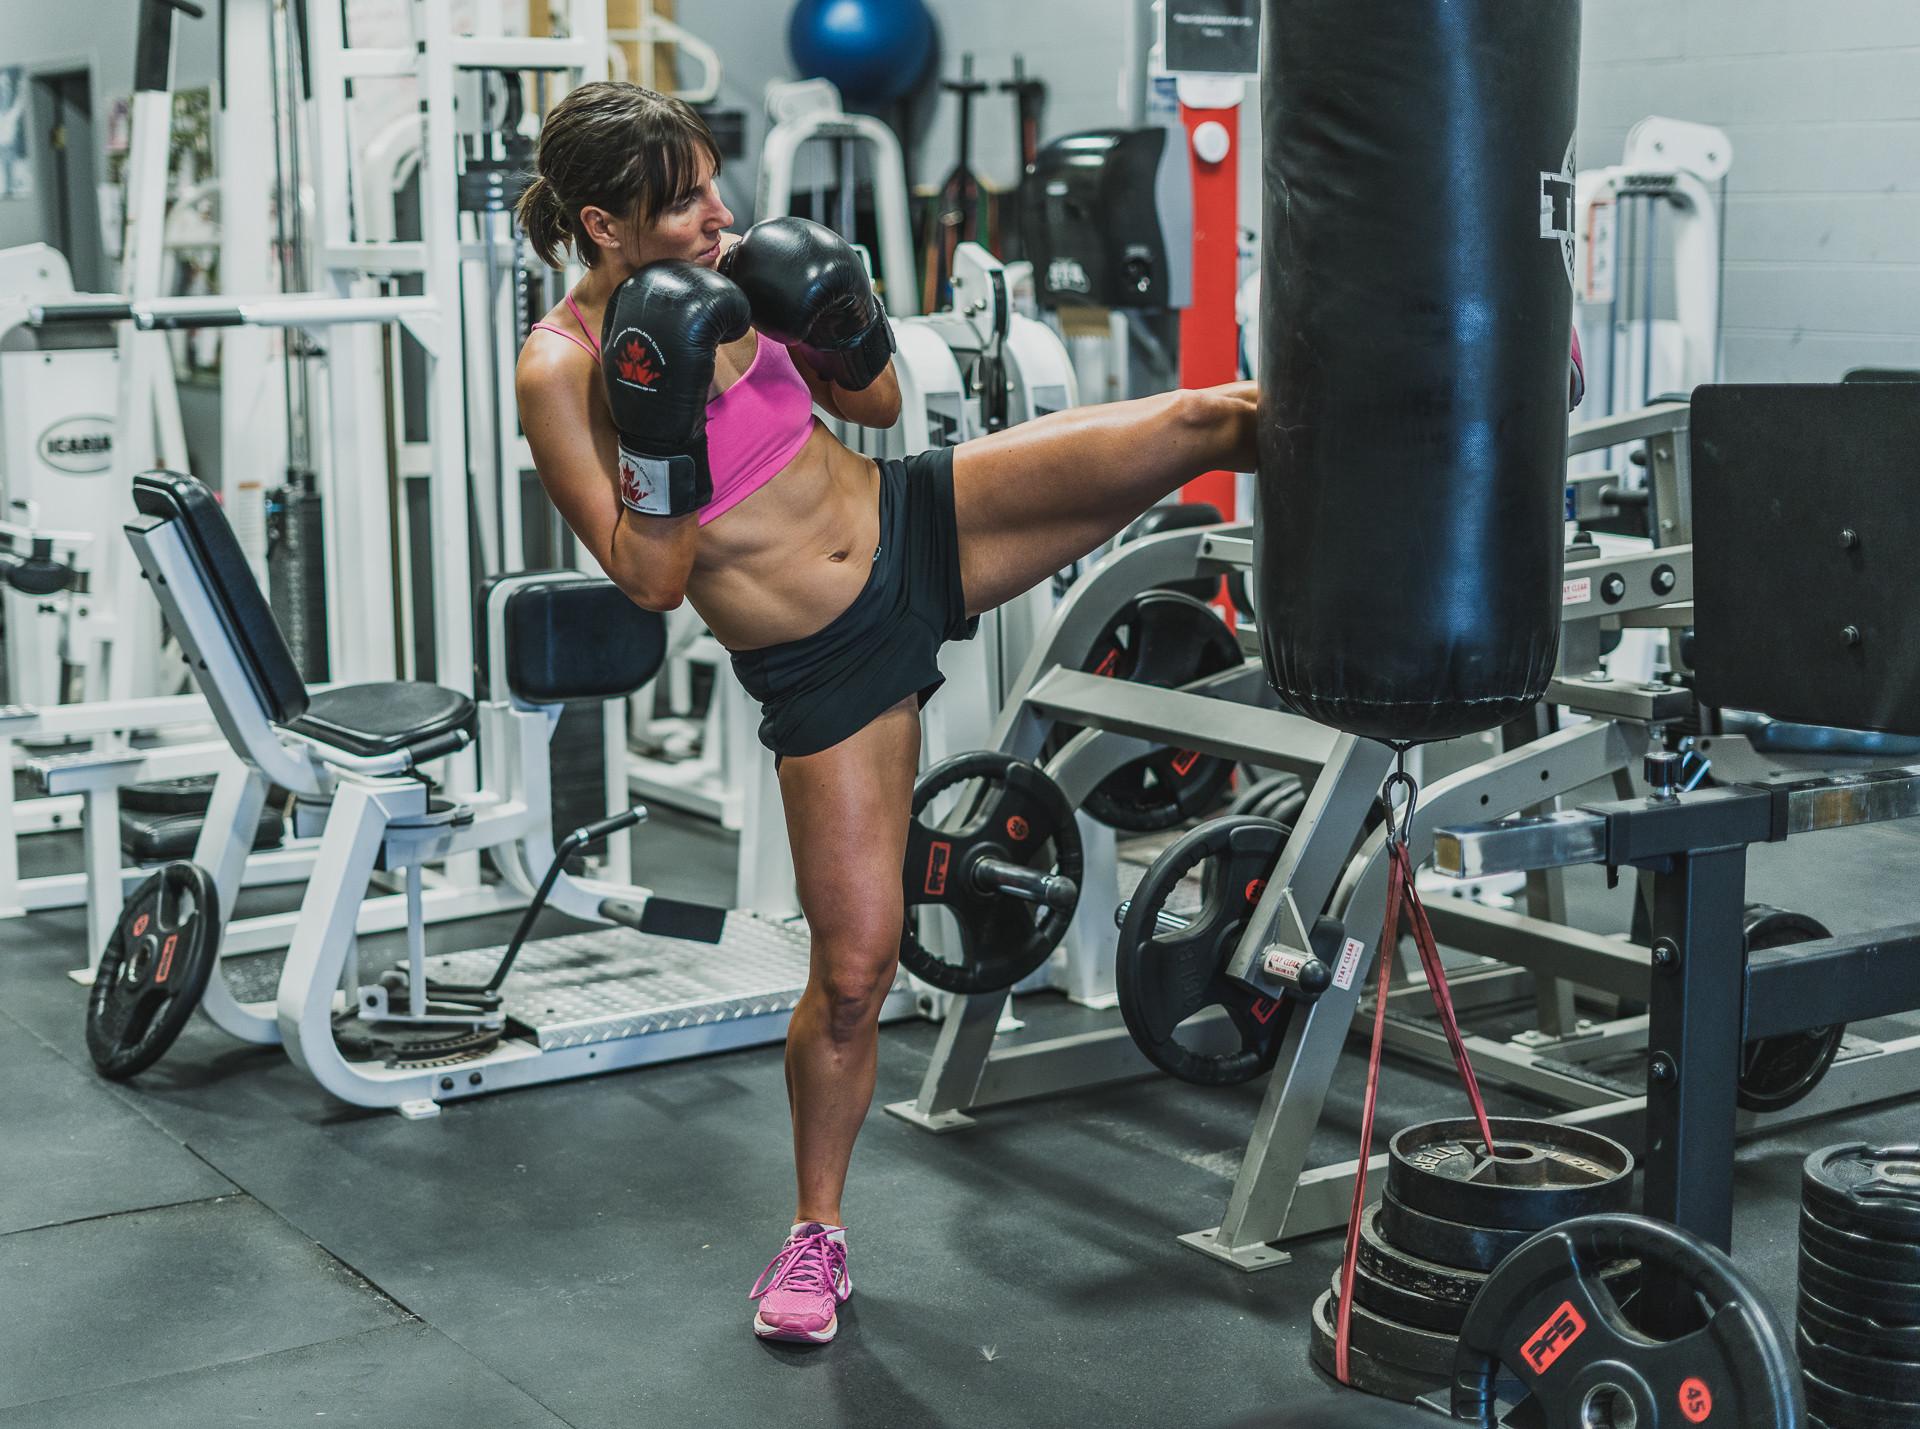 Calgary Sports Photographer, Fitness and Health photoshoot